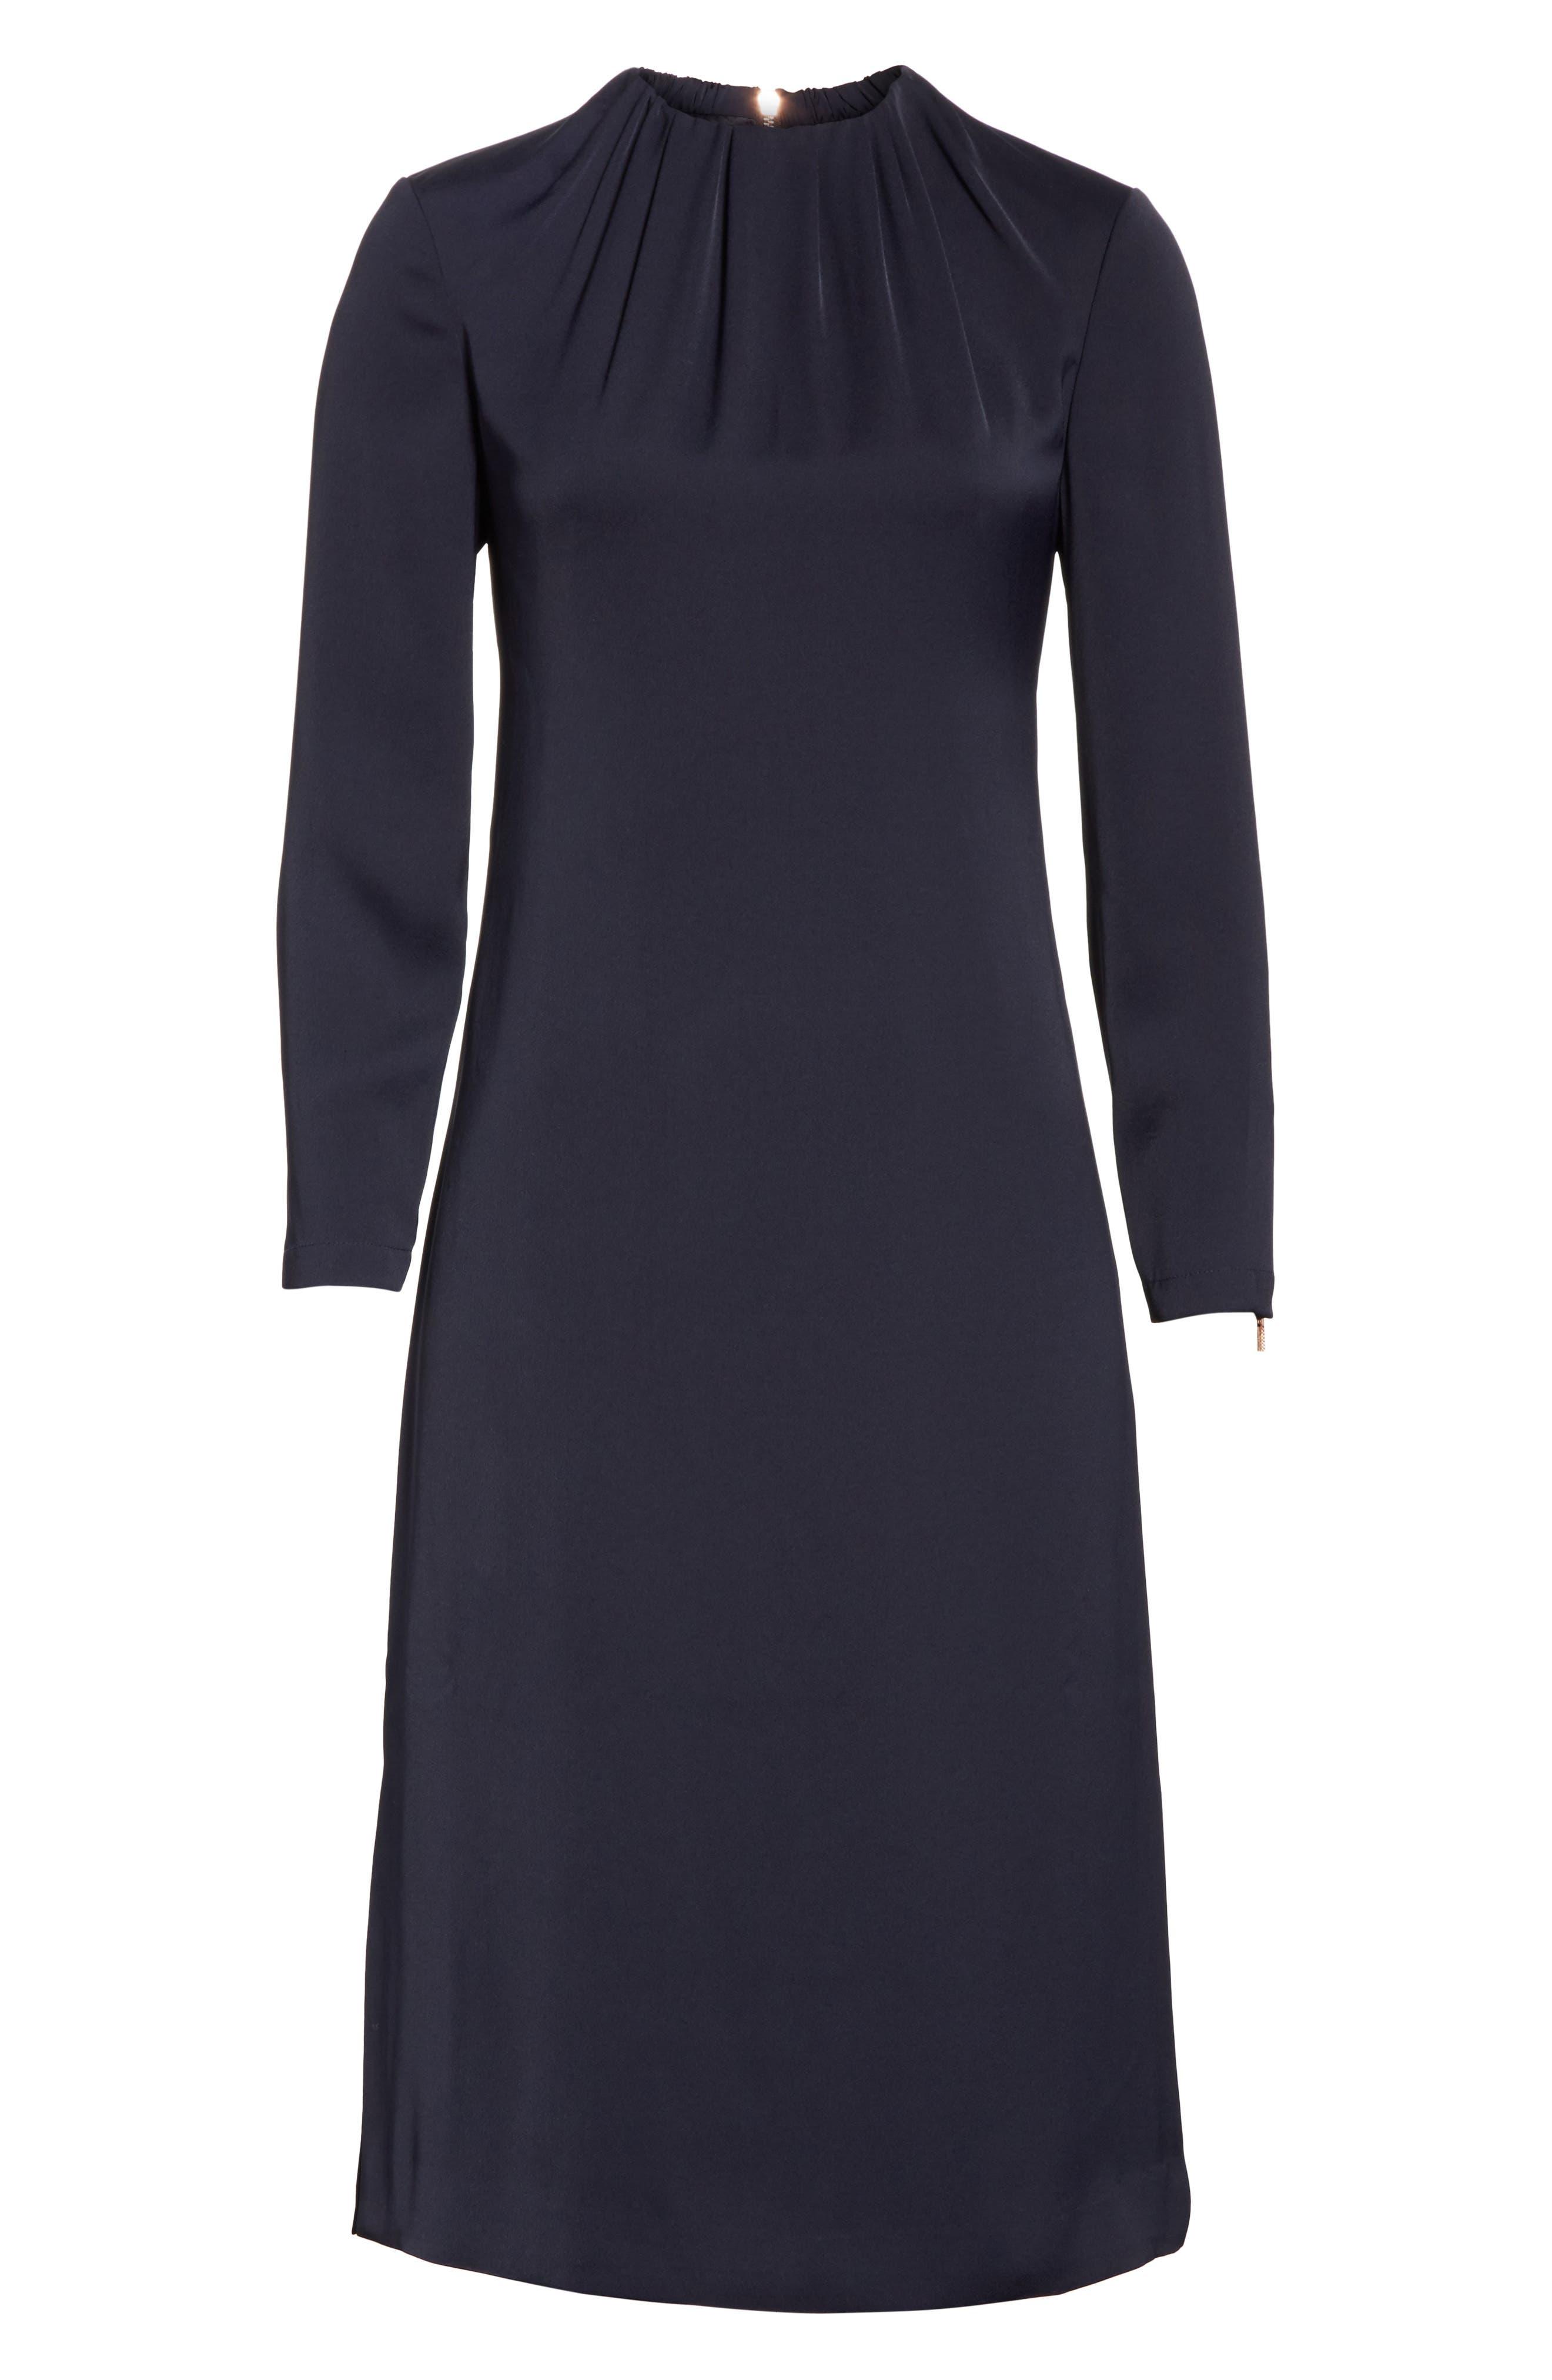 Ruched Neck Dress,                             Alternate thumbnail 6, color,                             402